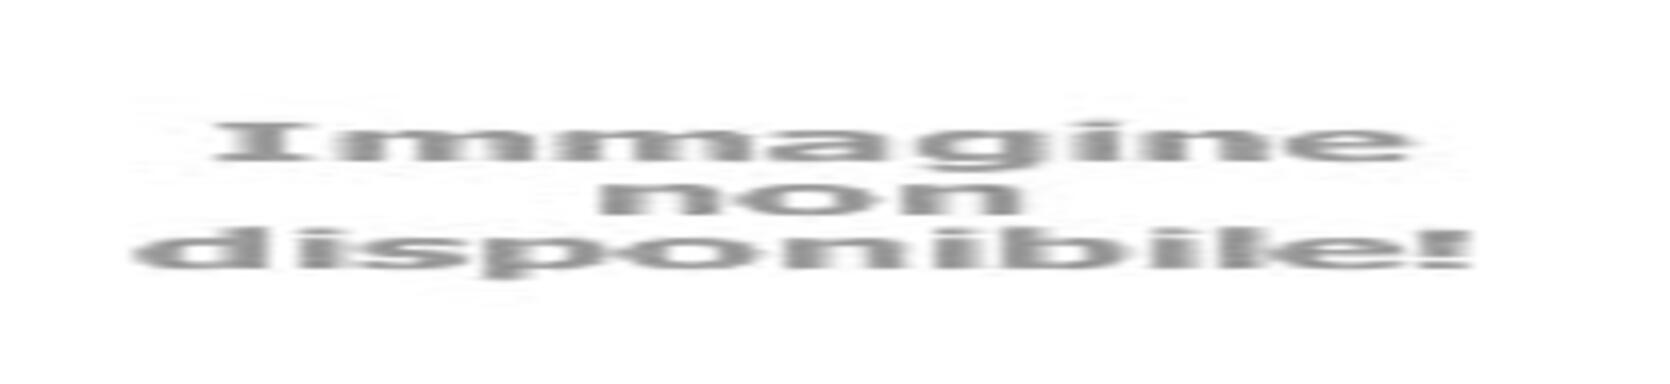 basketriminicrabs it 2-2696-settore-giovanile-u15-ecc-a-straordinaria-vittoria-nel-derby-con-santarcangelo 003